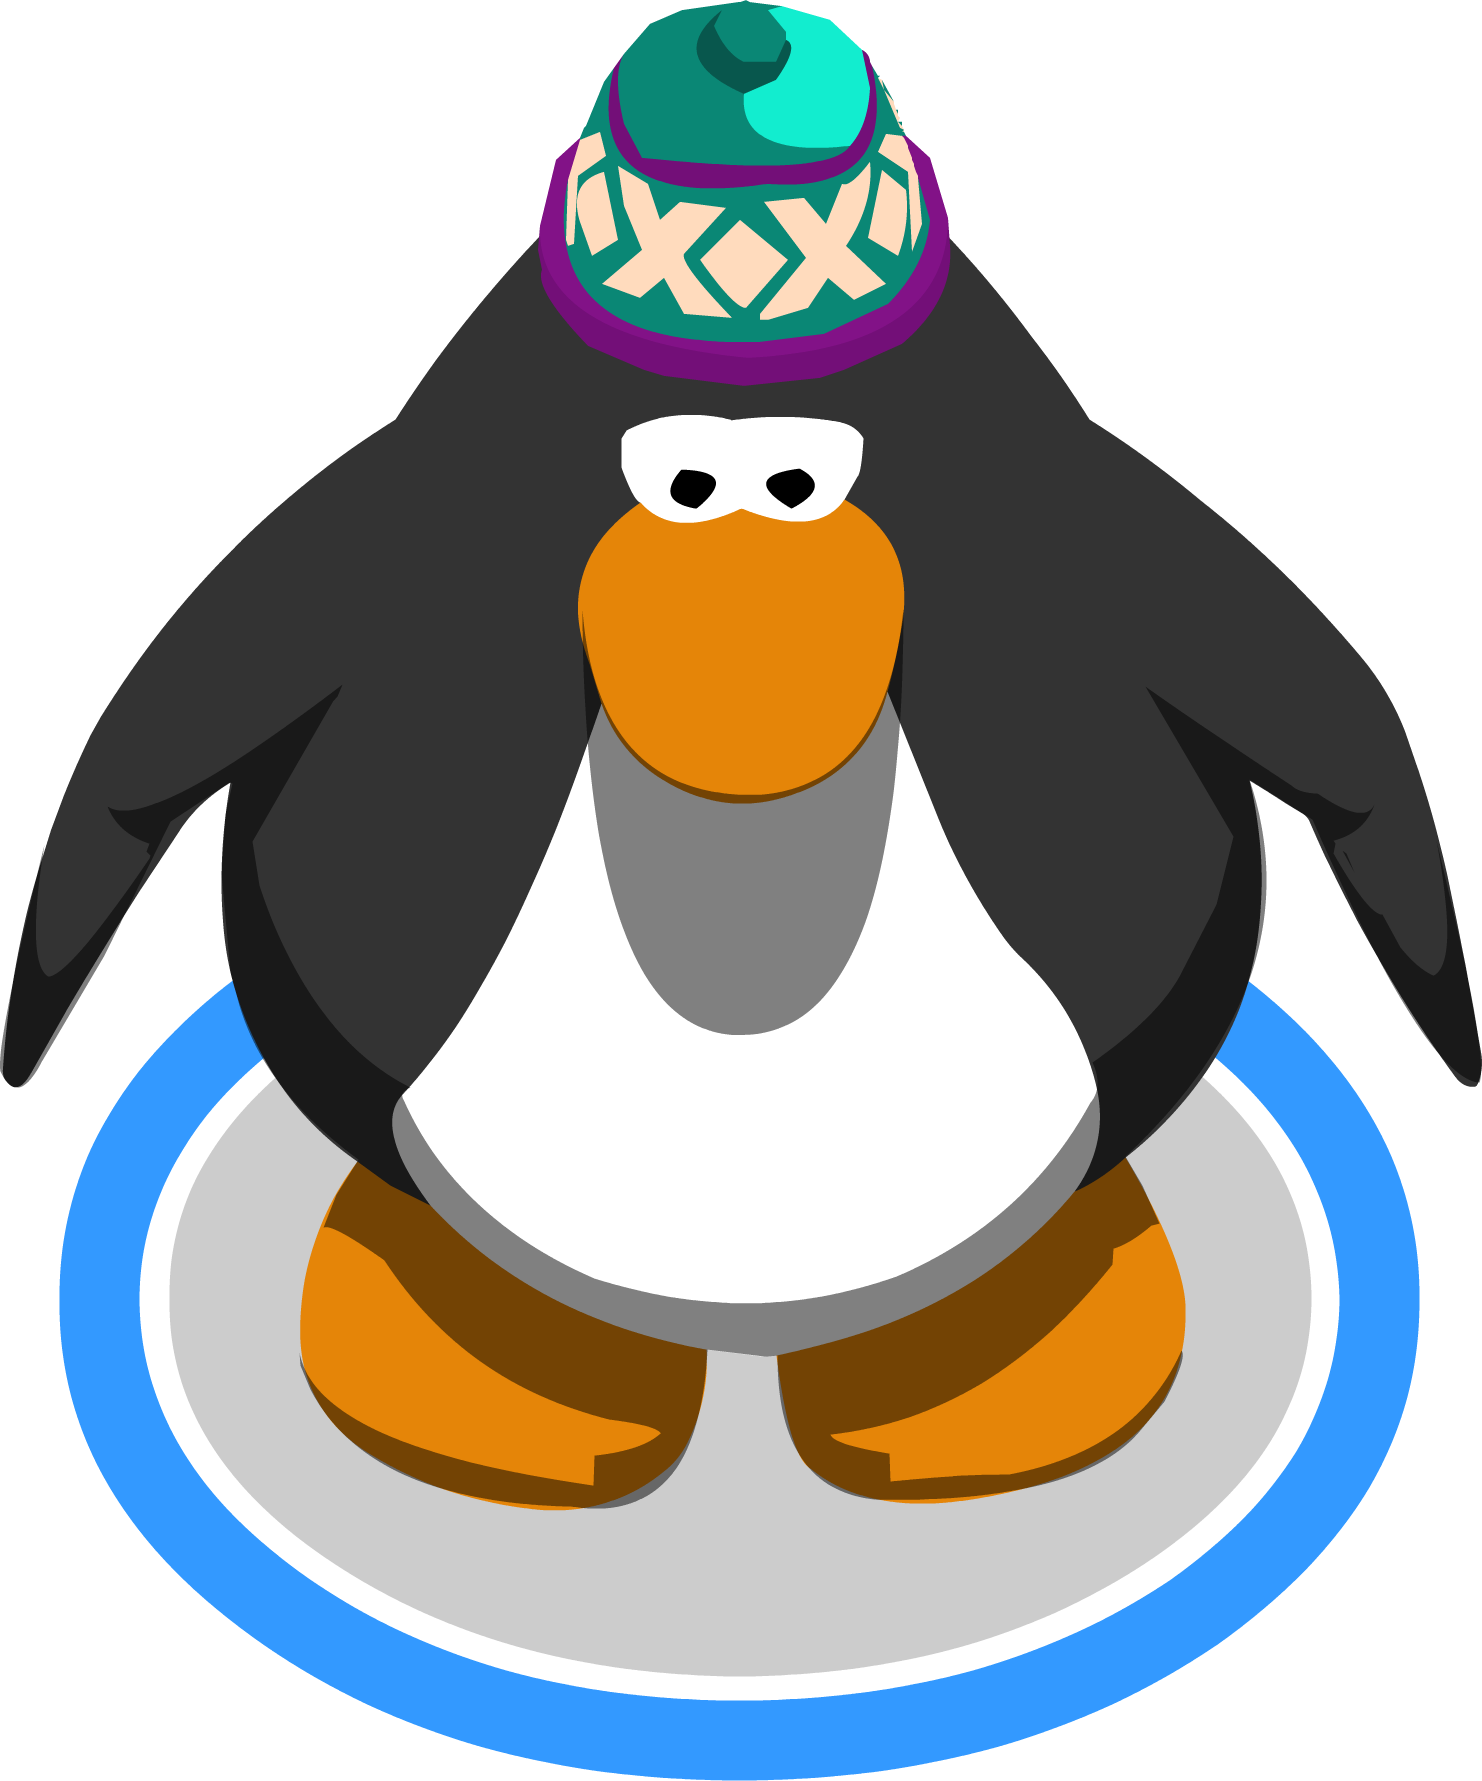 Image hat ig png. Clipart penguin rustic